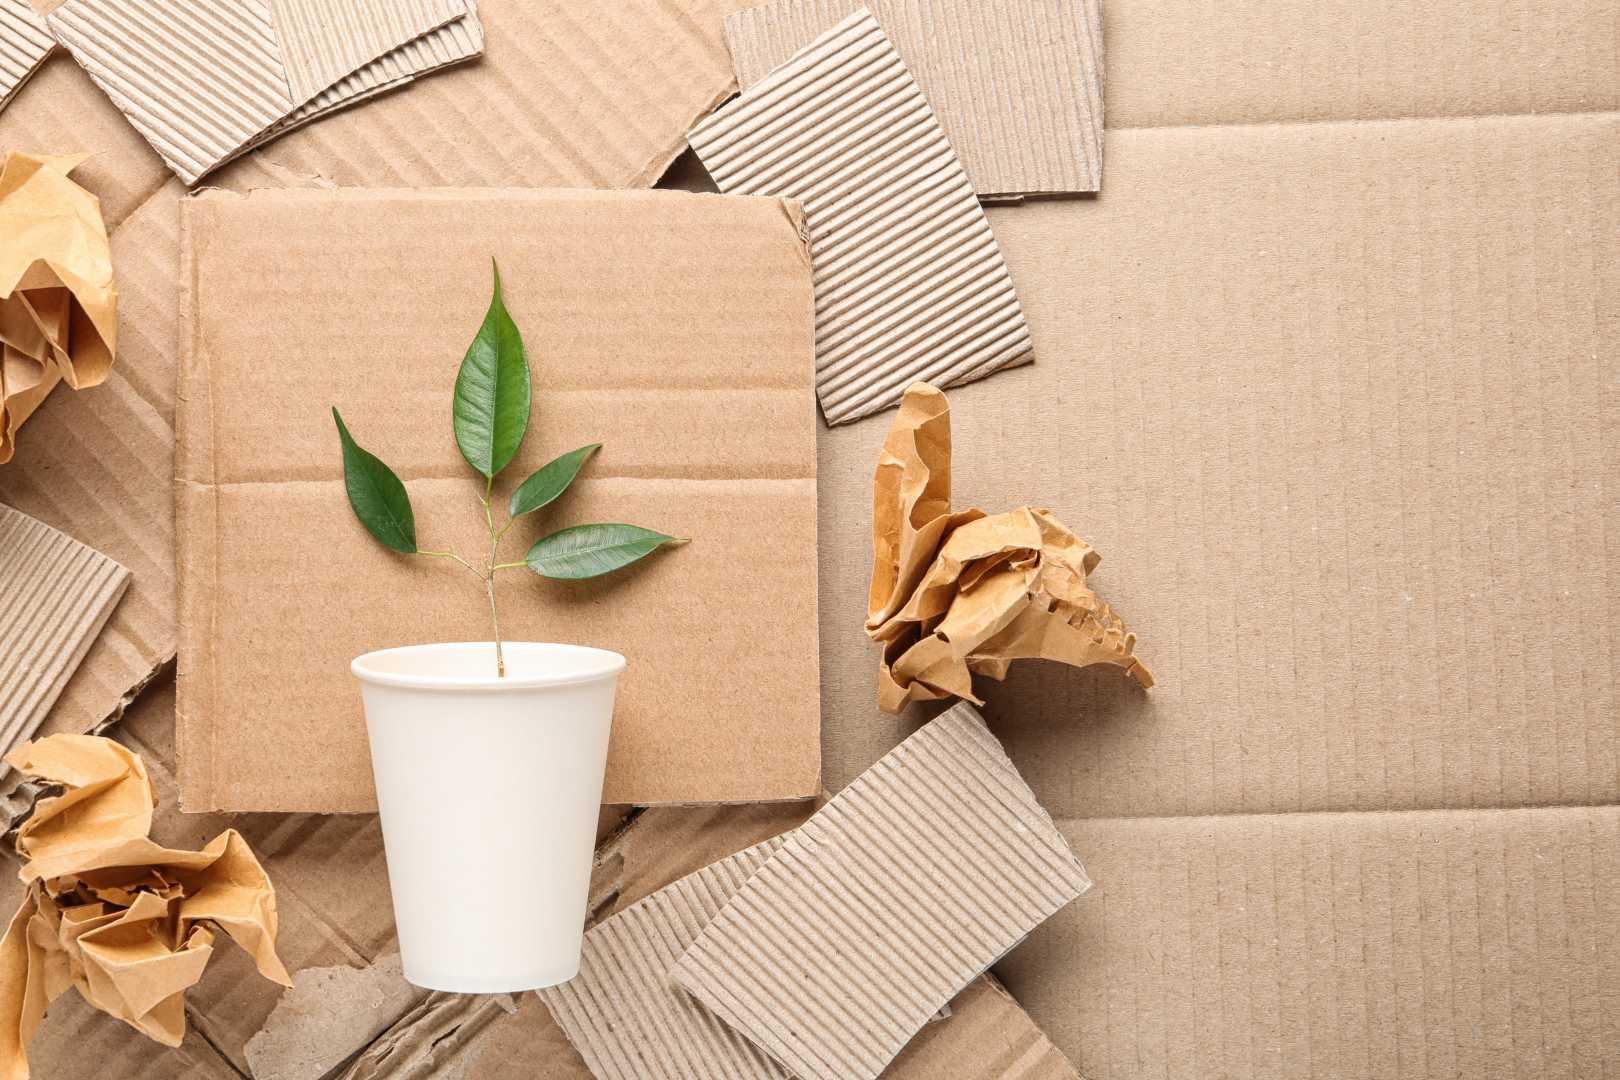 Recyclage karton